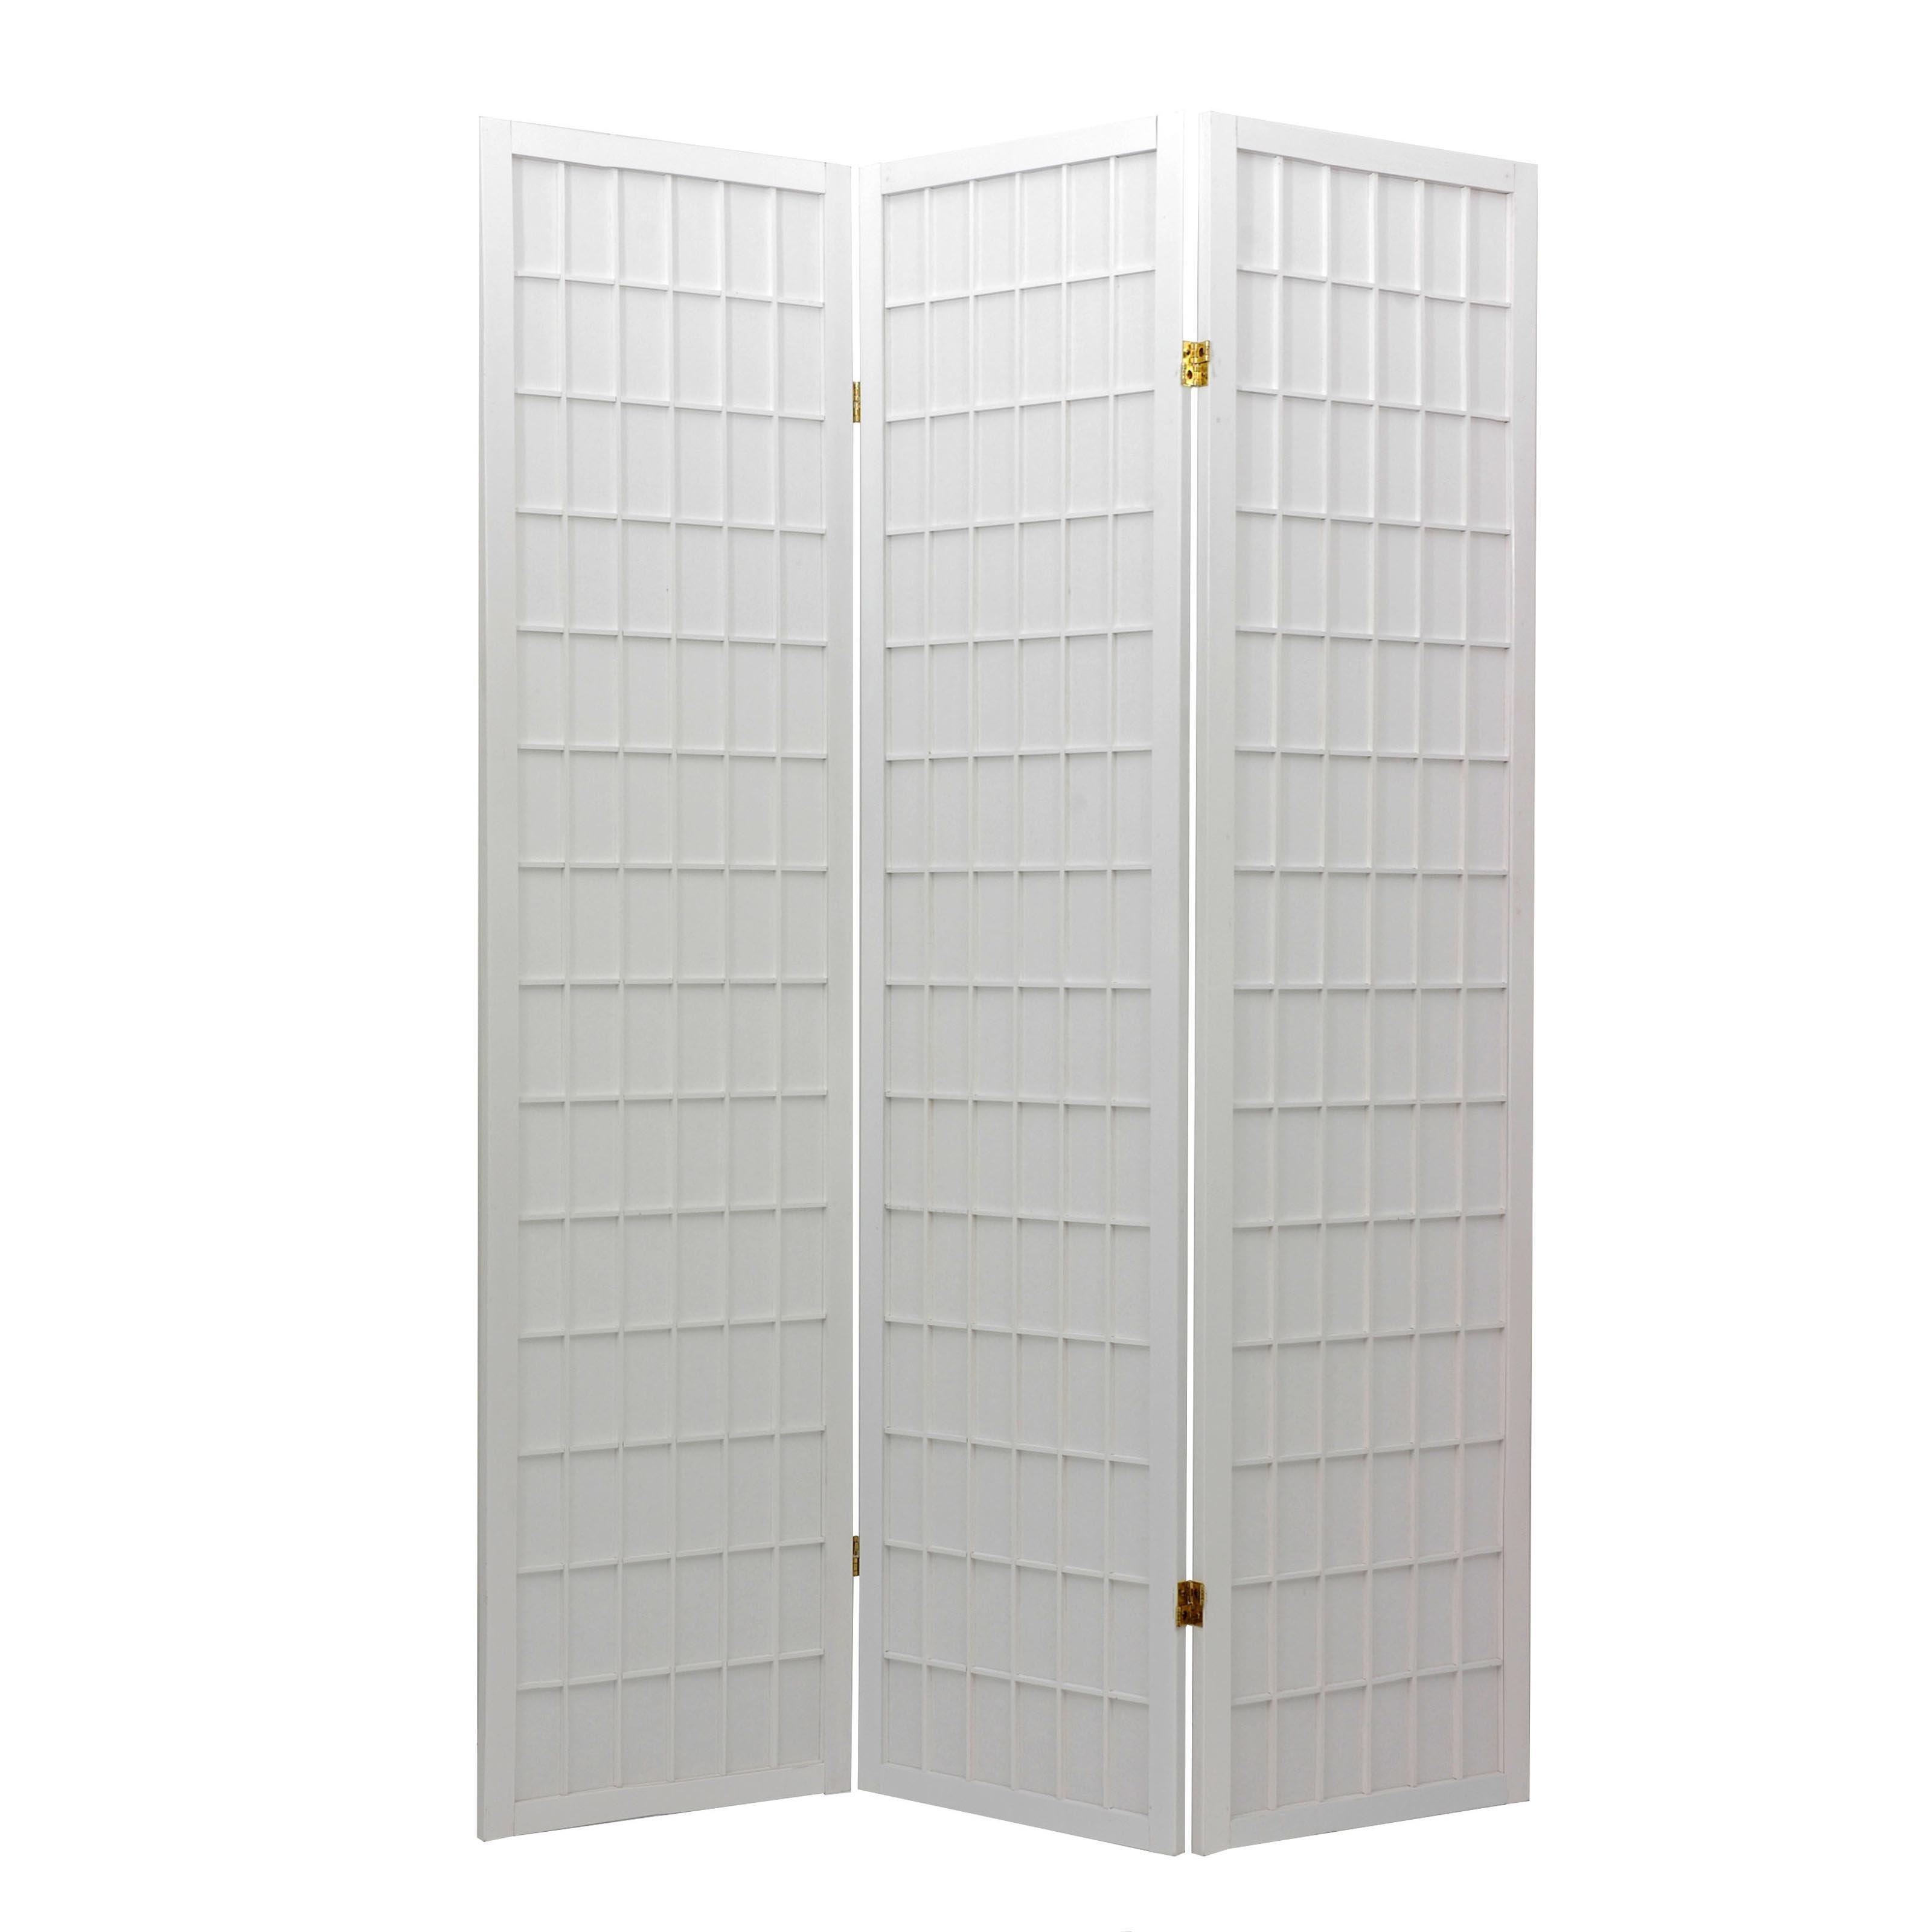 Oriental Furniture Window Pane Shoji Screen Room Divider - White